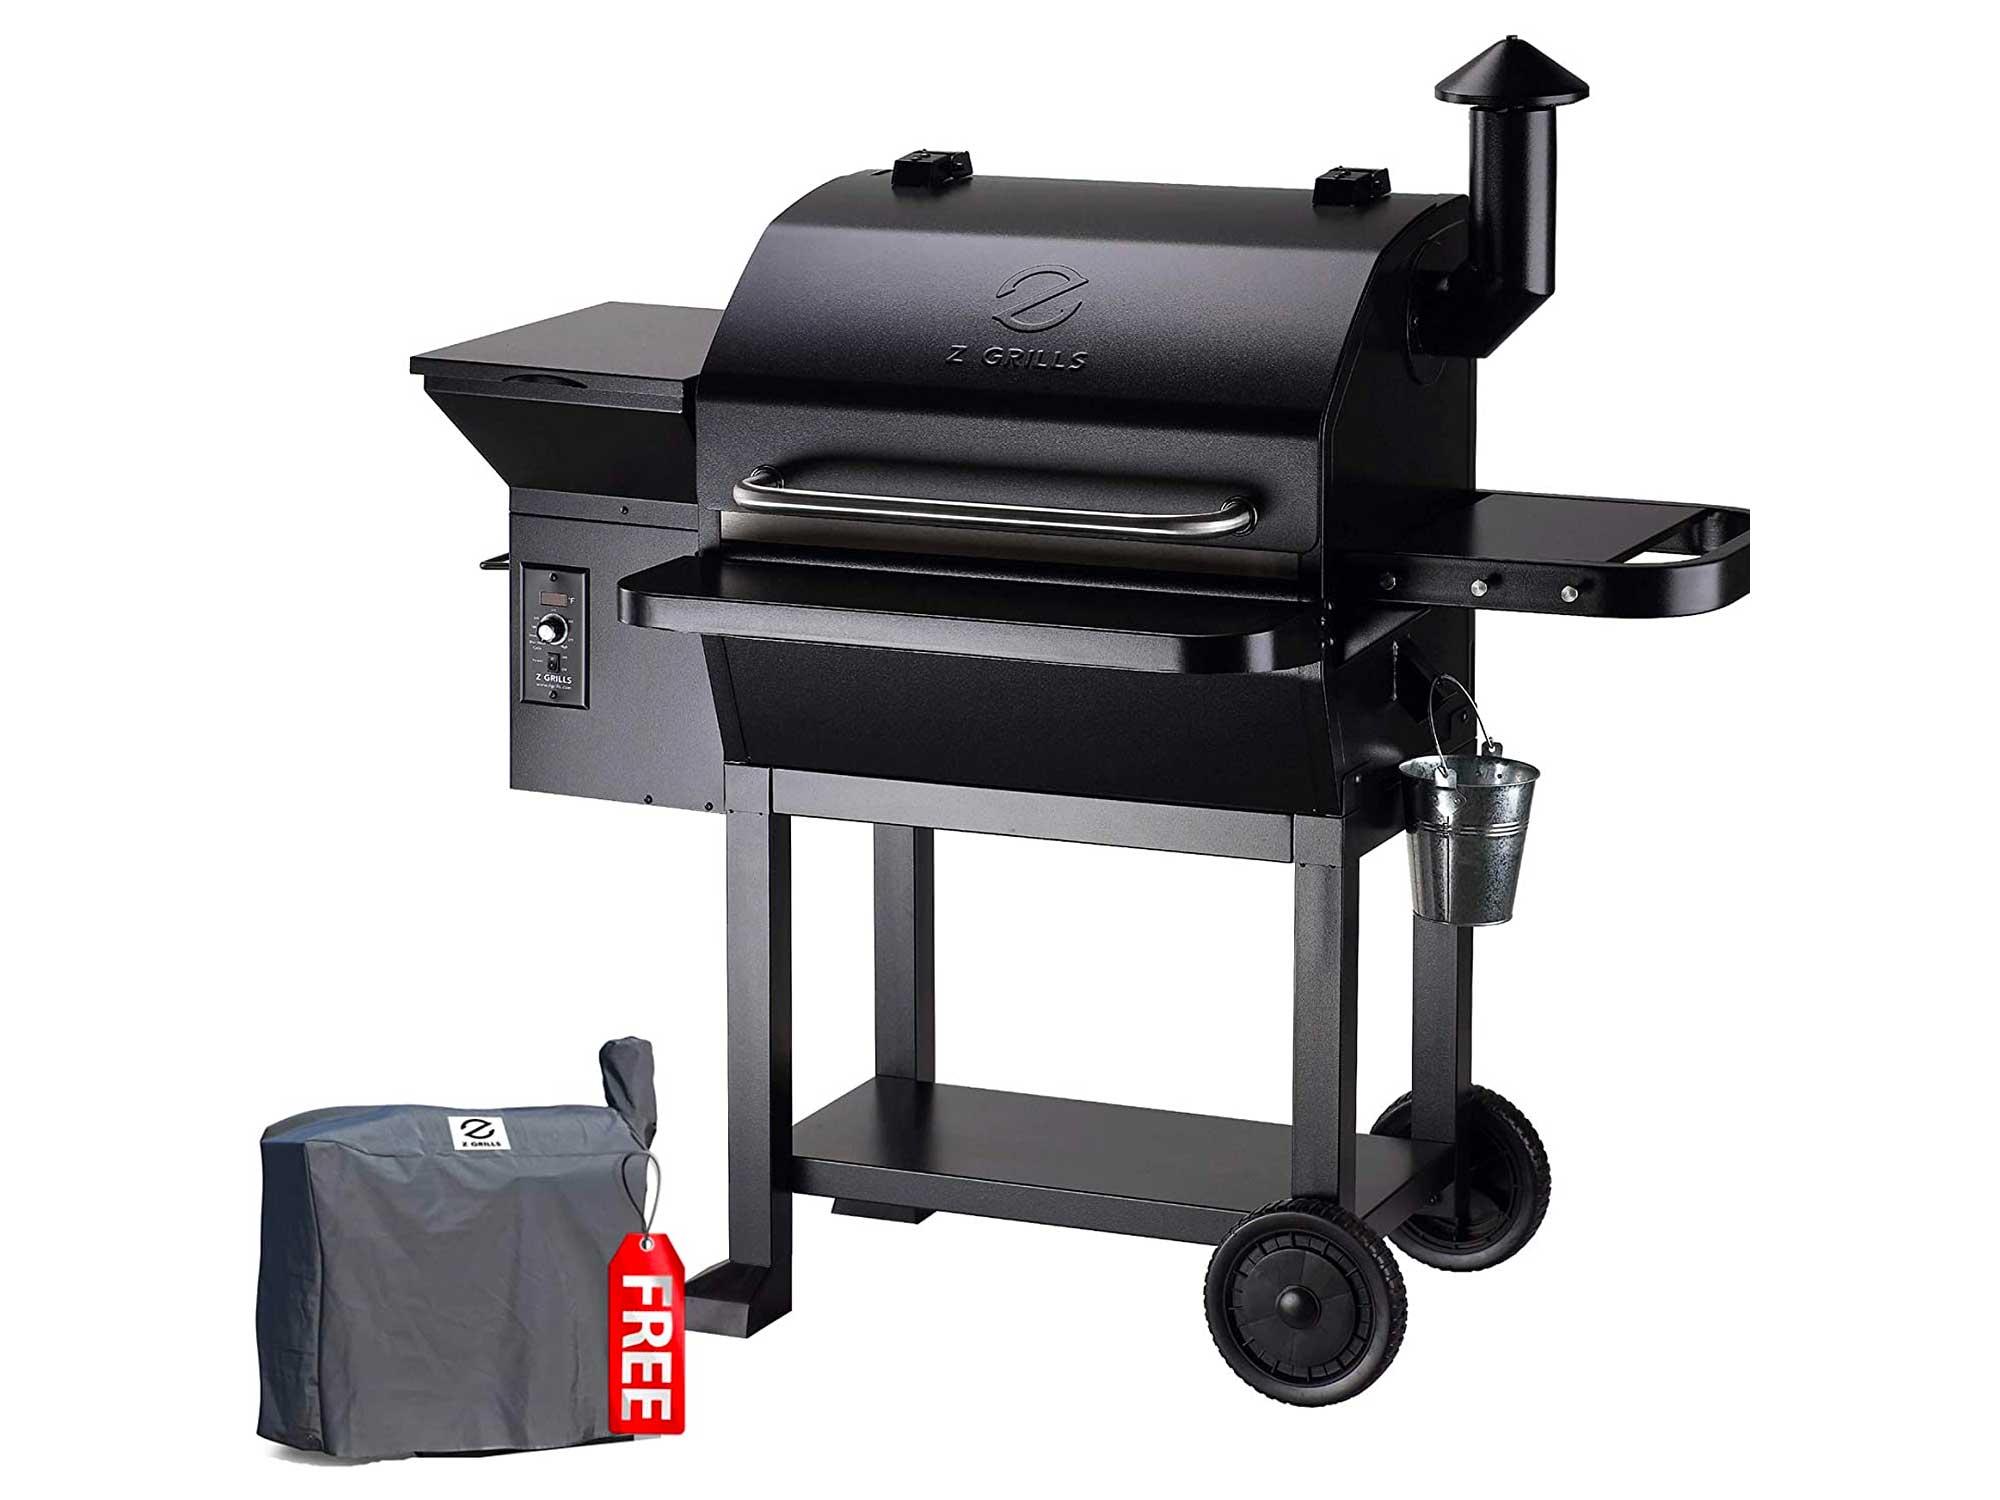 Z Grills 2020 New Model Wood Pellet Grill & Smoker